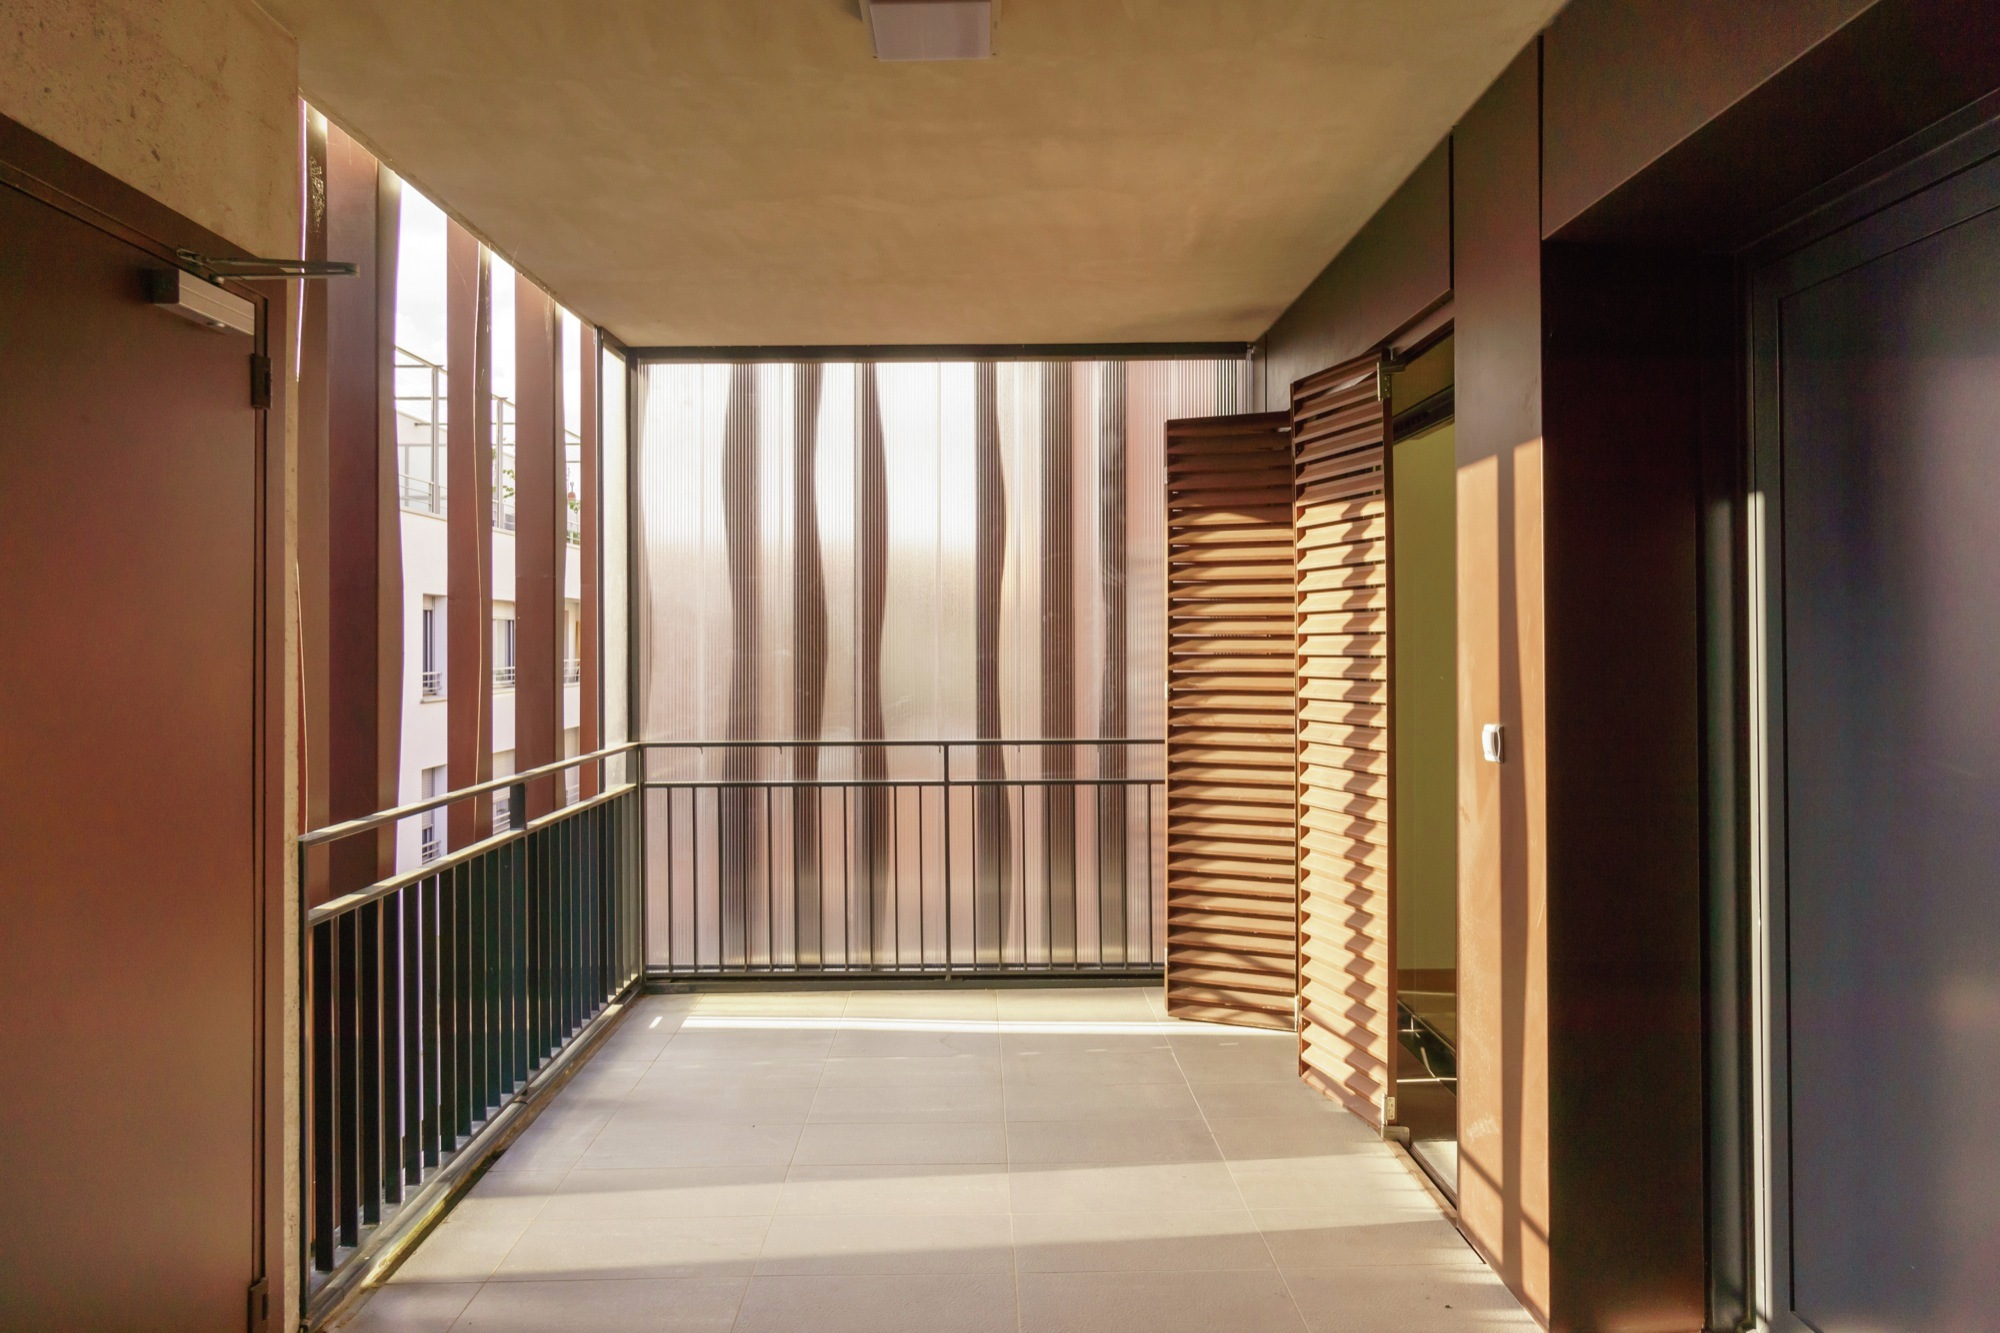 galer a de residencia yaoitcha taillandier architectes associ s 4. Black Bedroom Furniture Sets. Home Design Ideas